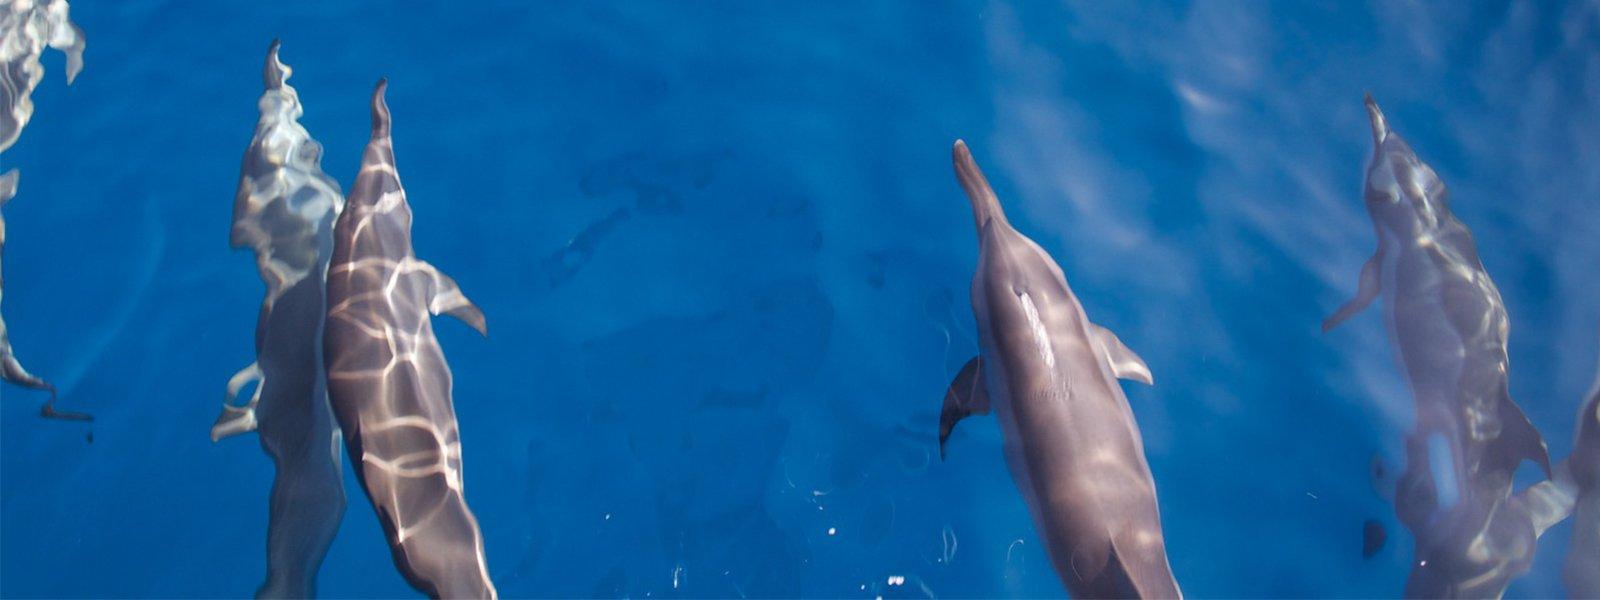 kuredu-sports-dolphins_1600x600